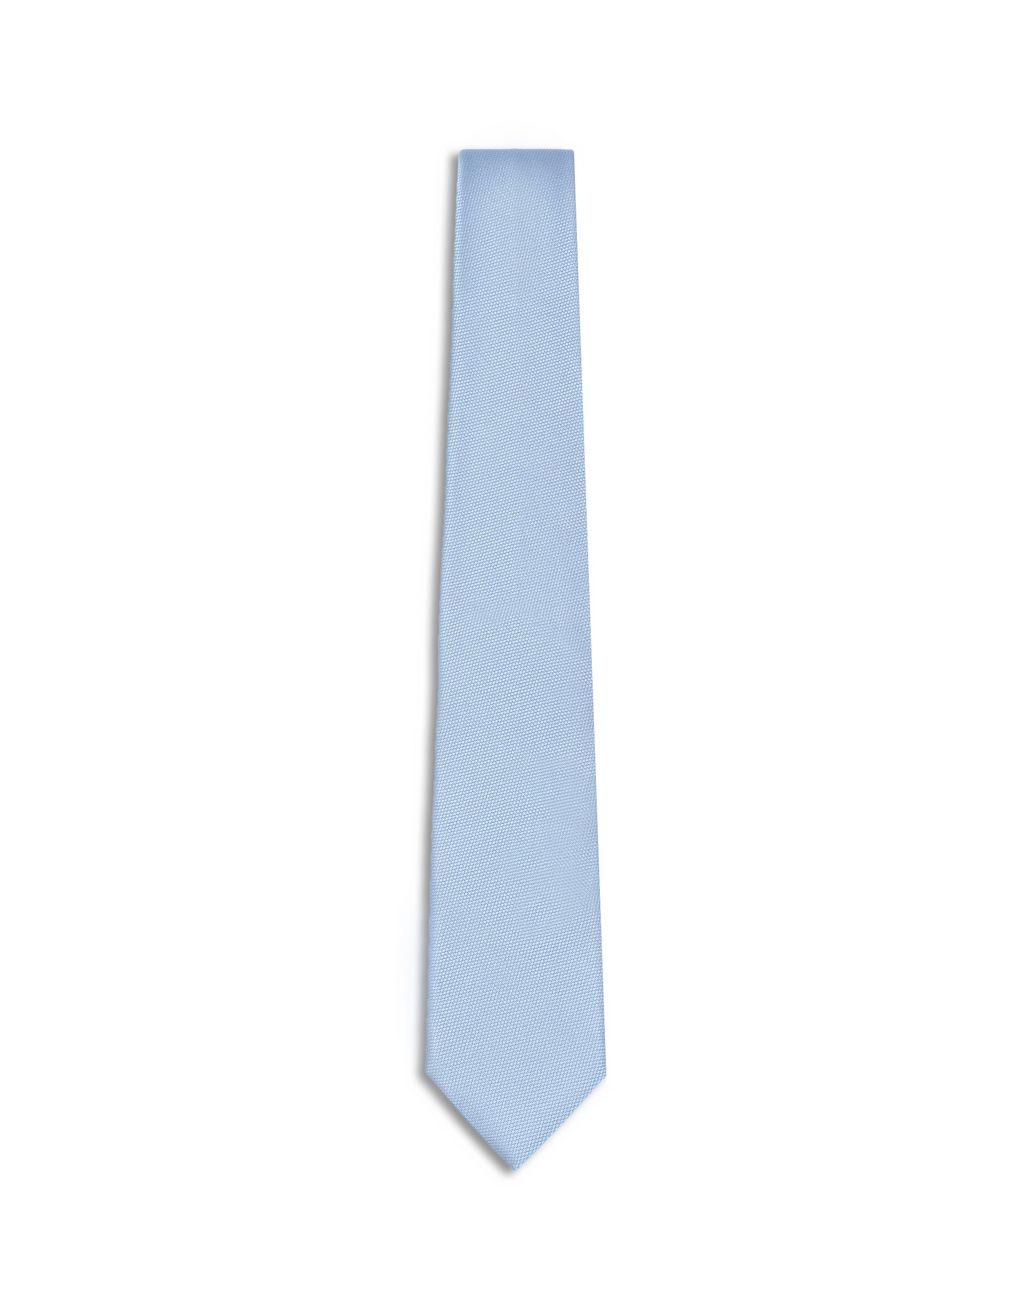 BRIONI Blaue Webkrawatte Krawatte Herren f